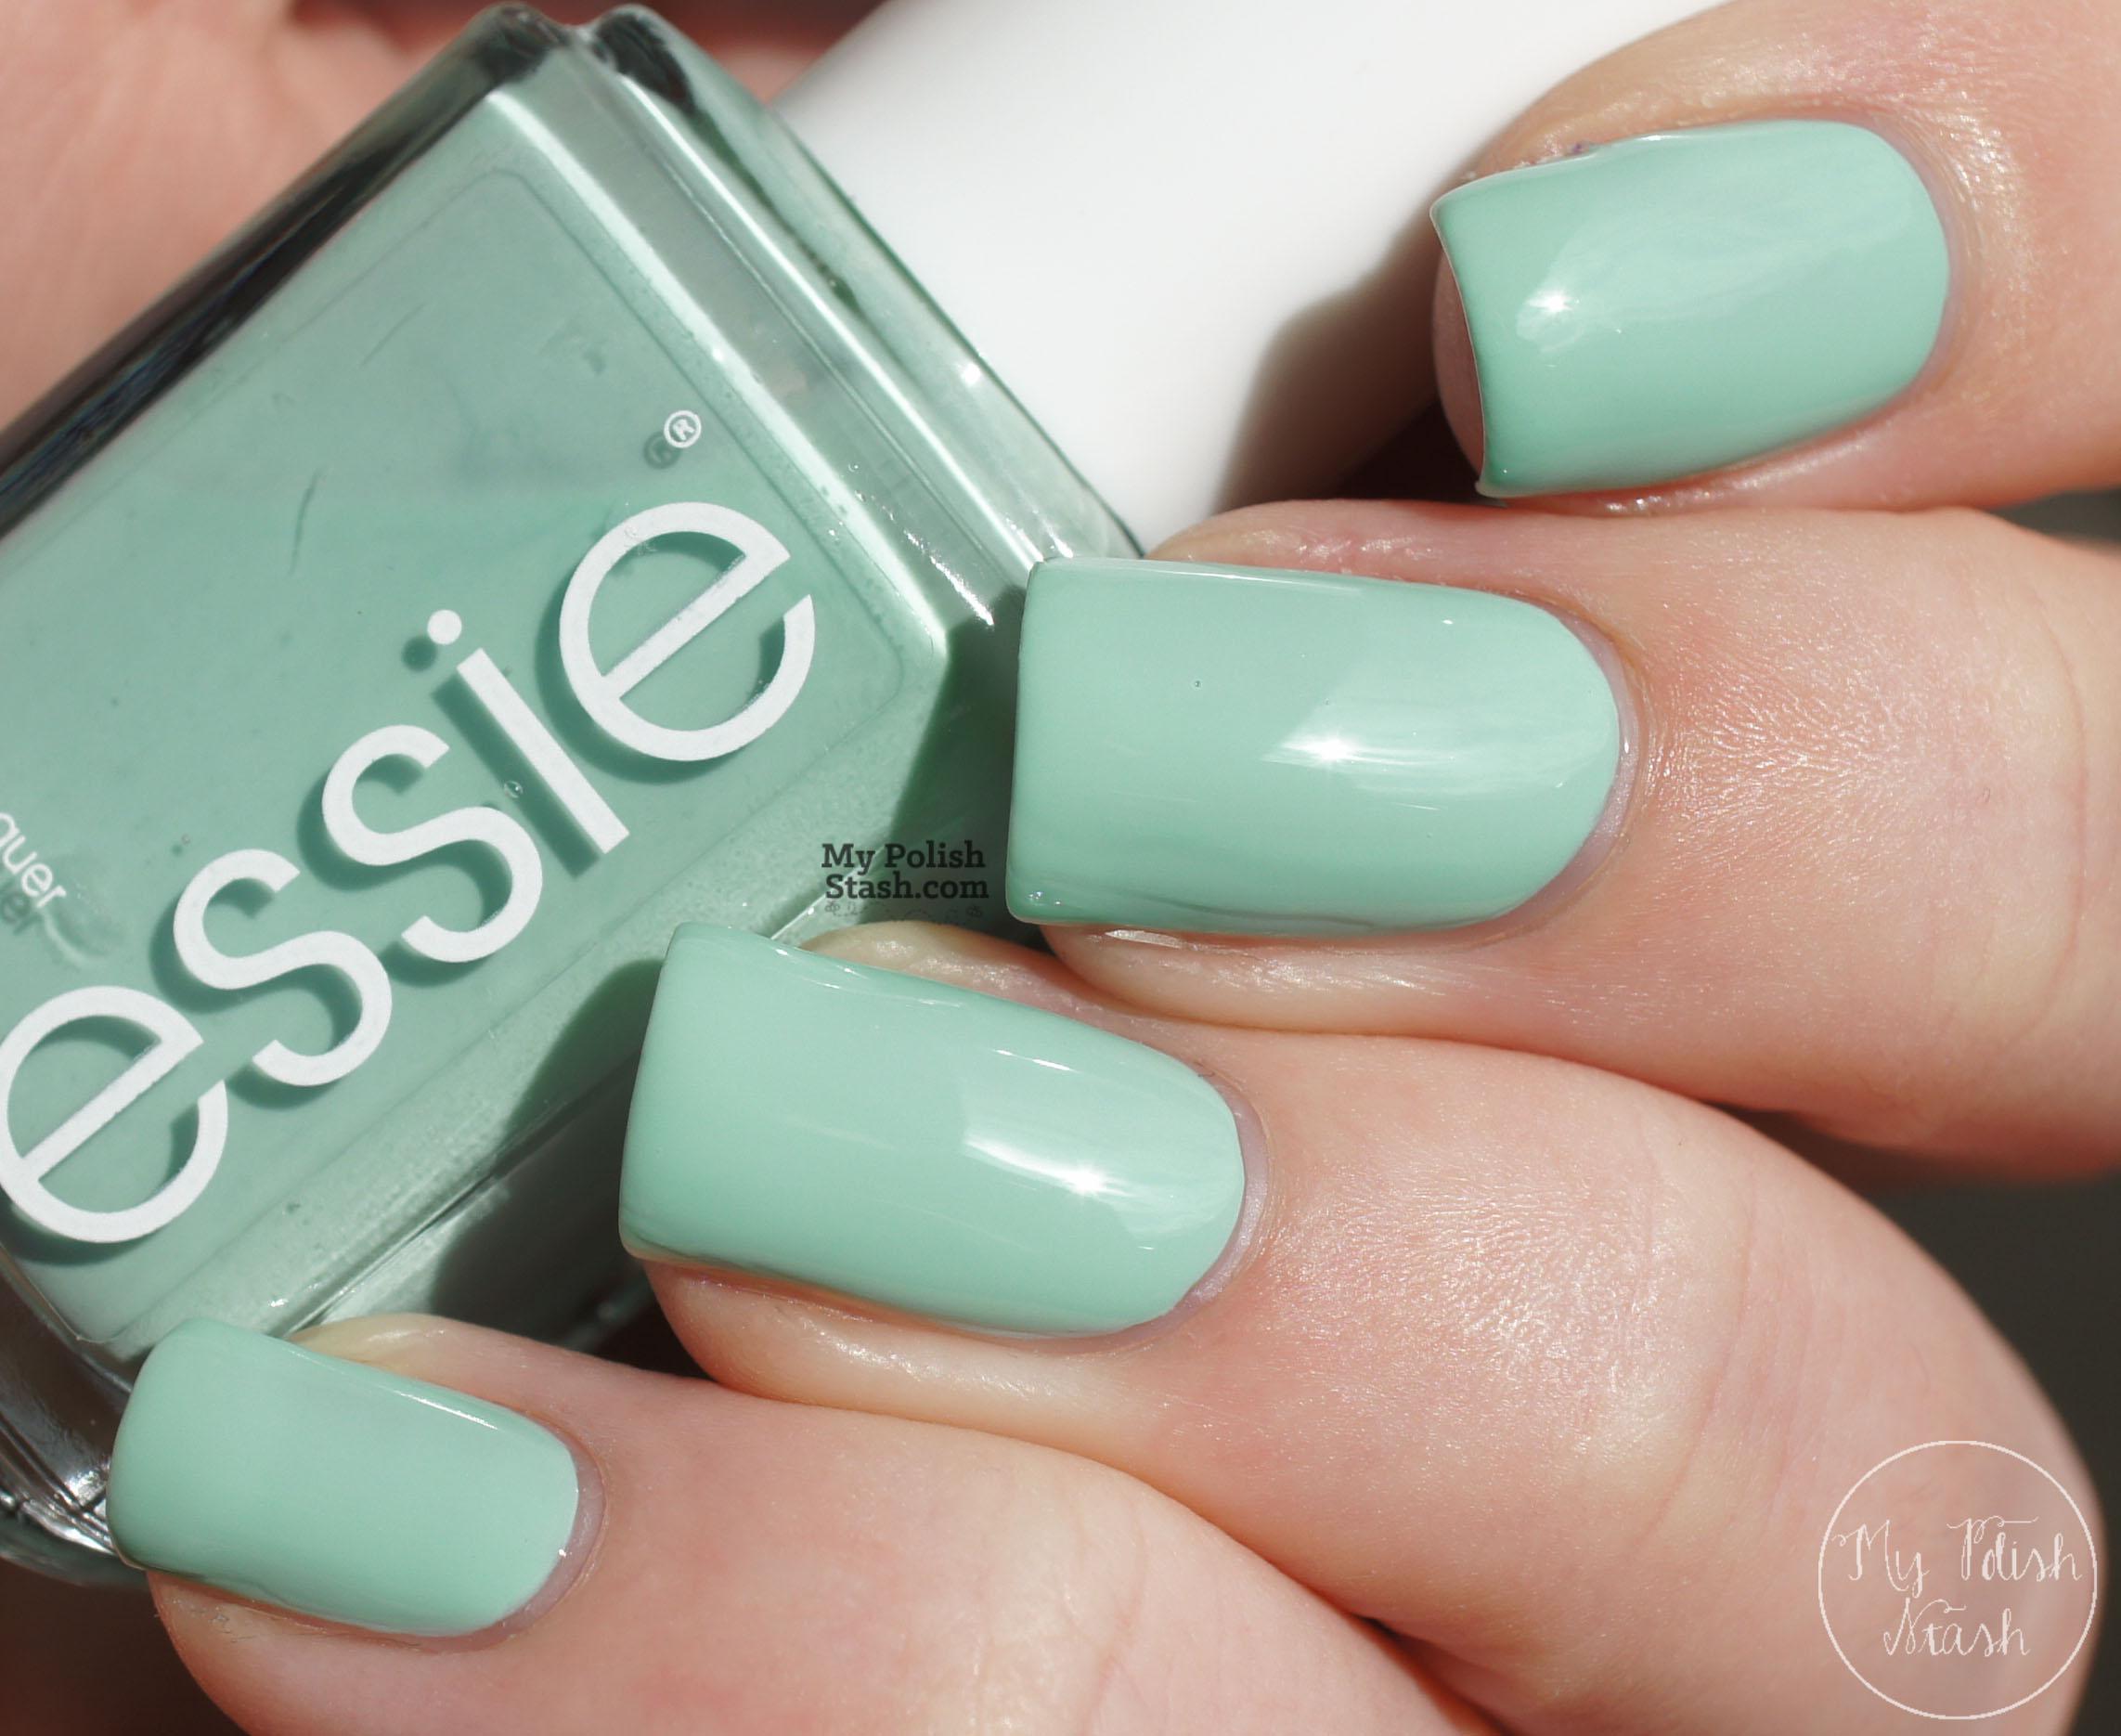 My Polish Stash: [Spring Favorites] Essie - Mint Candy Apple